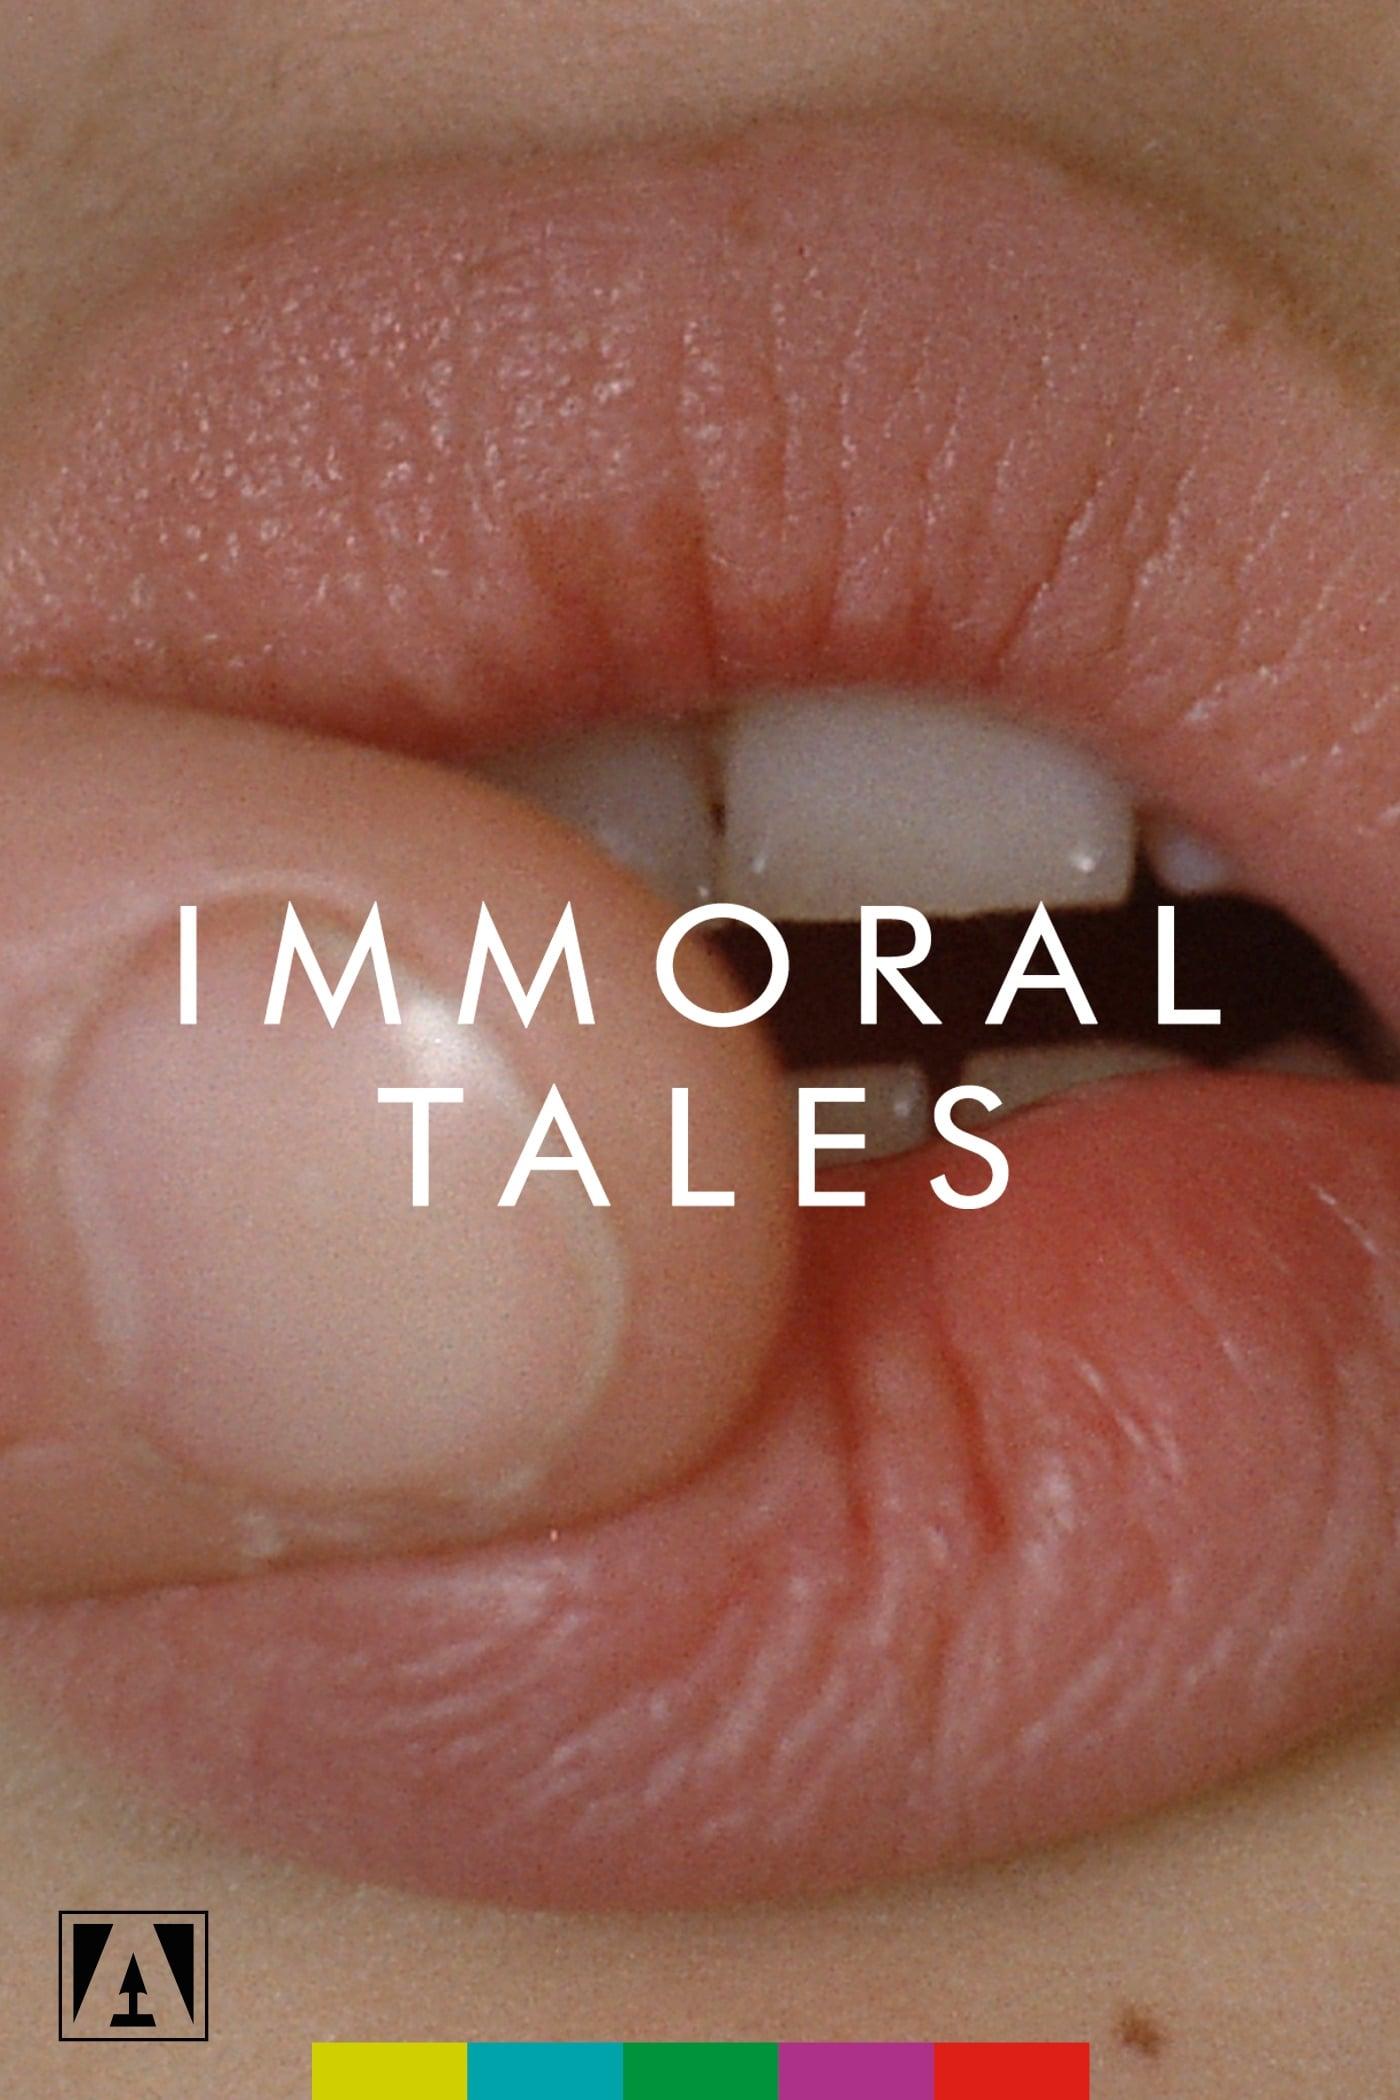 Pascale christophe paloma picasso contes immoraux 1 - 2 part 3